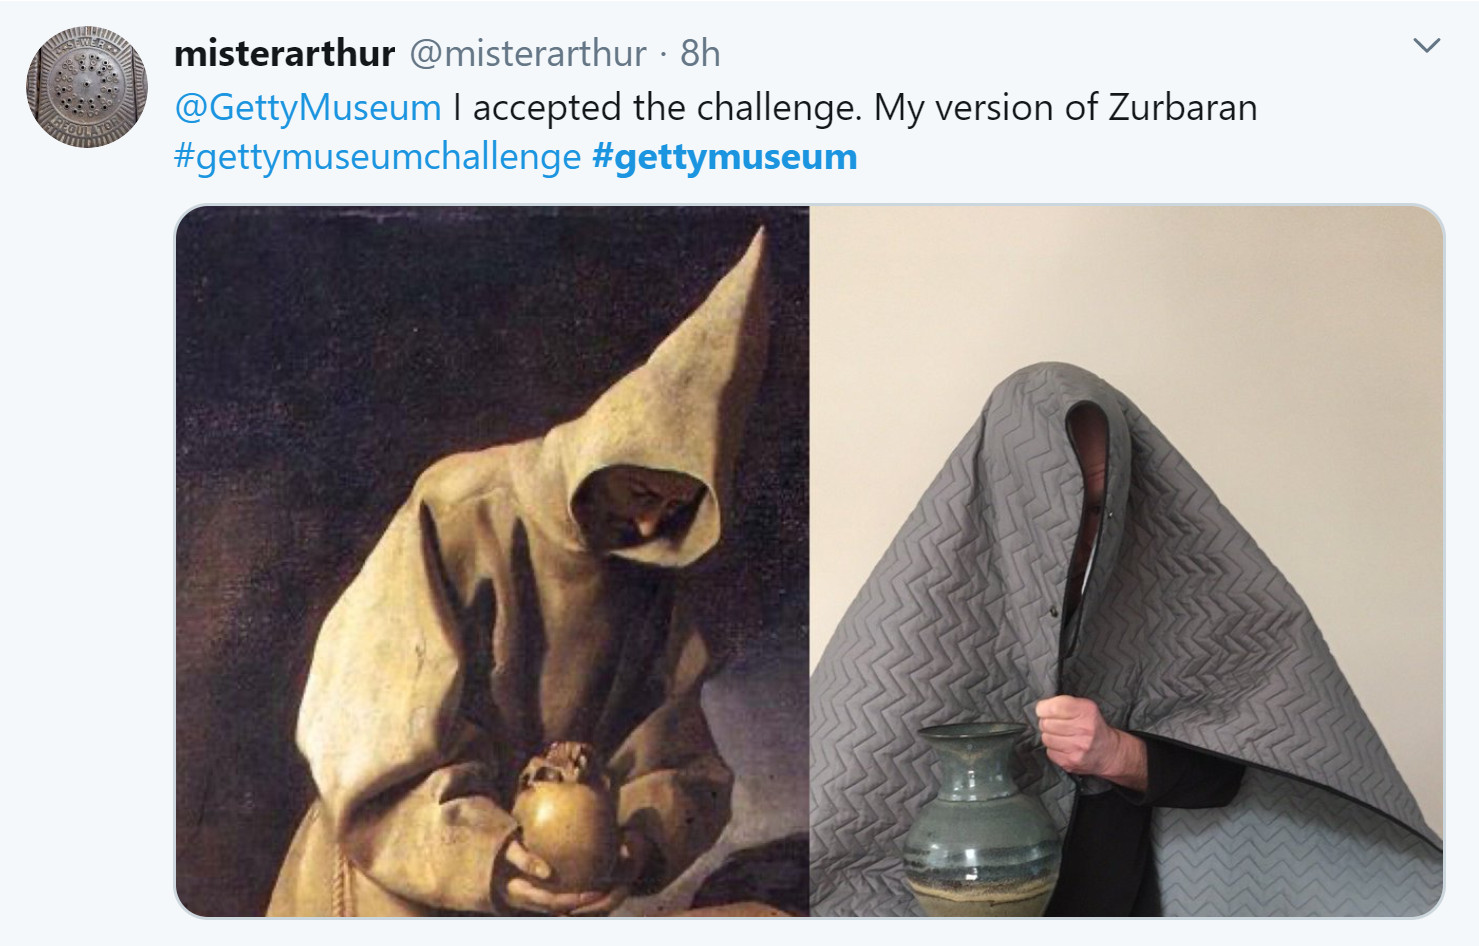 Getty Museum challenge Mrarthur